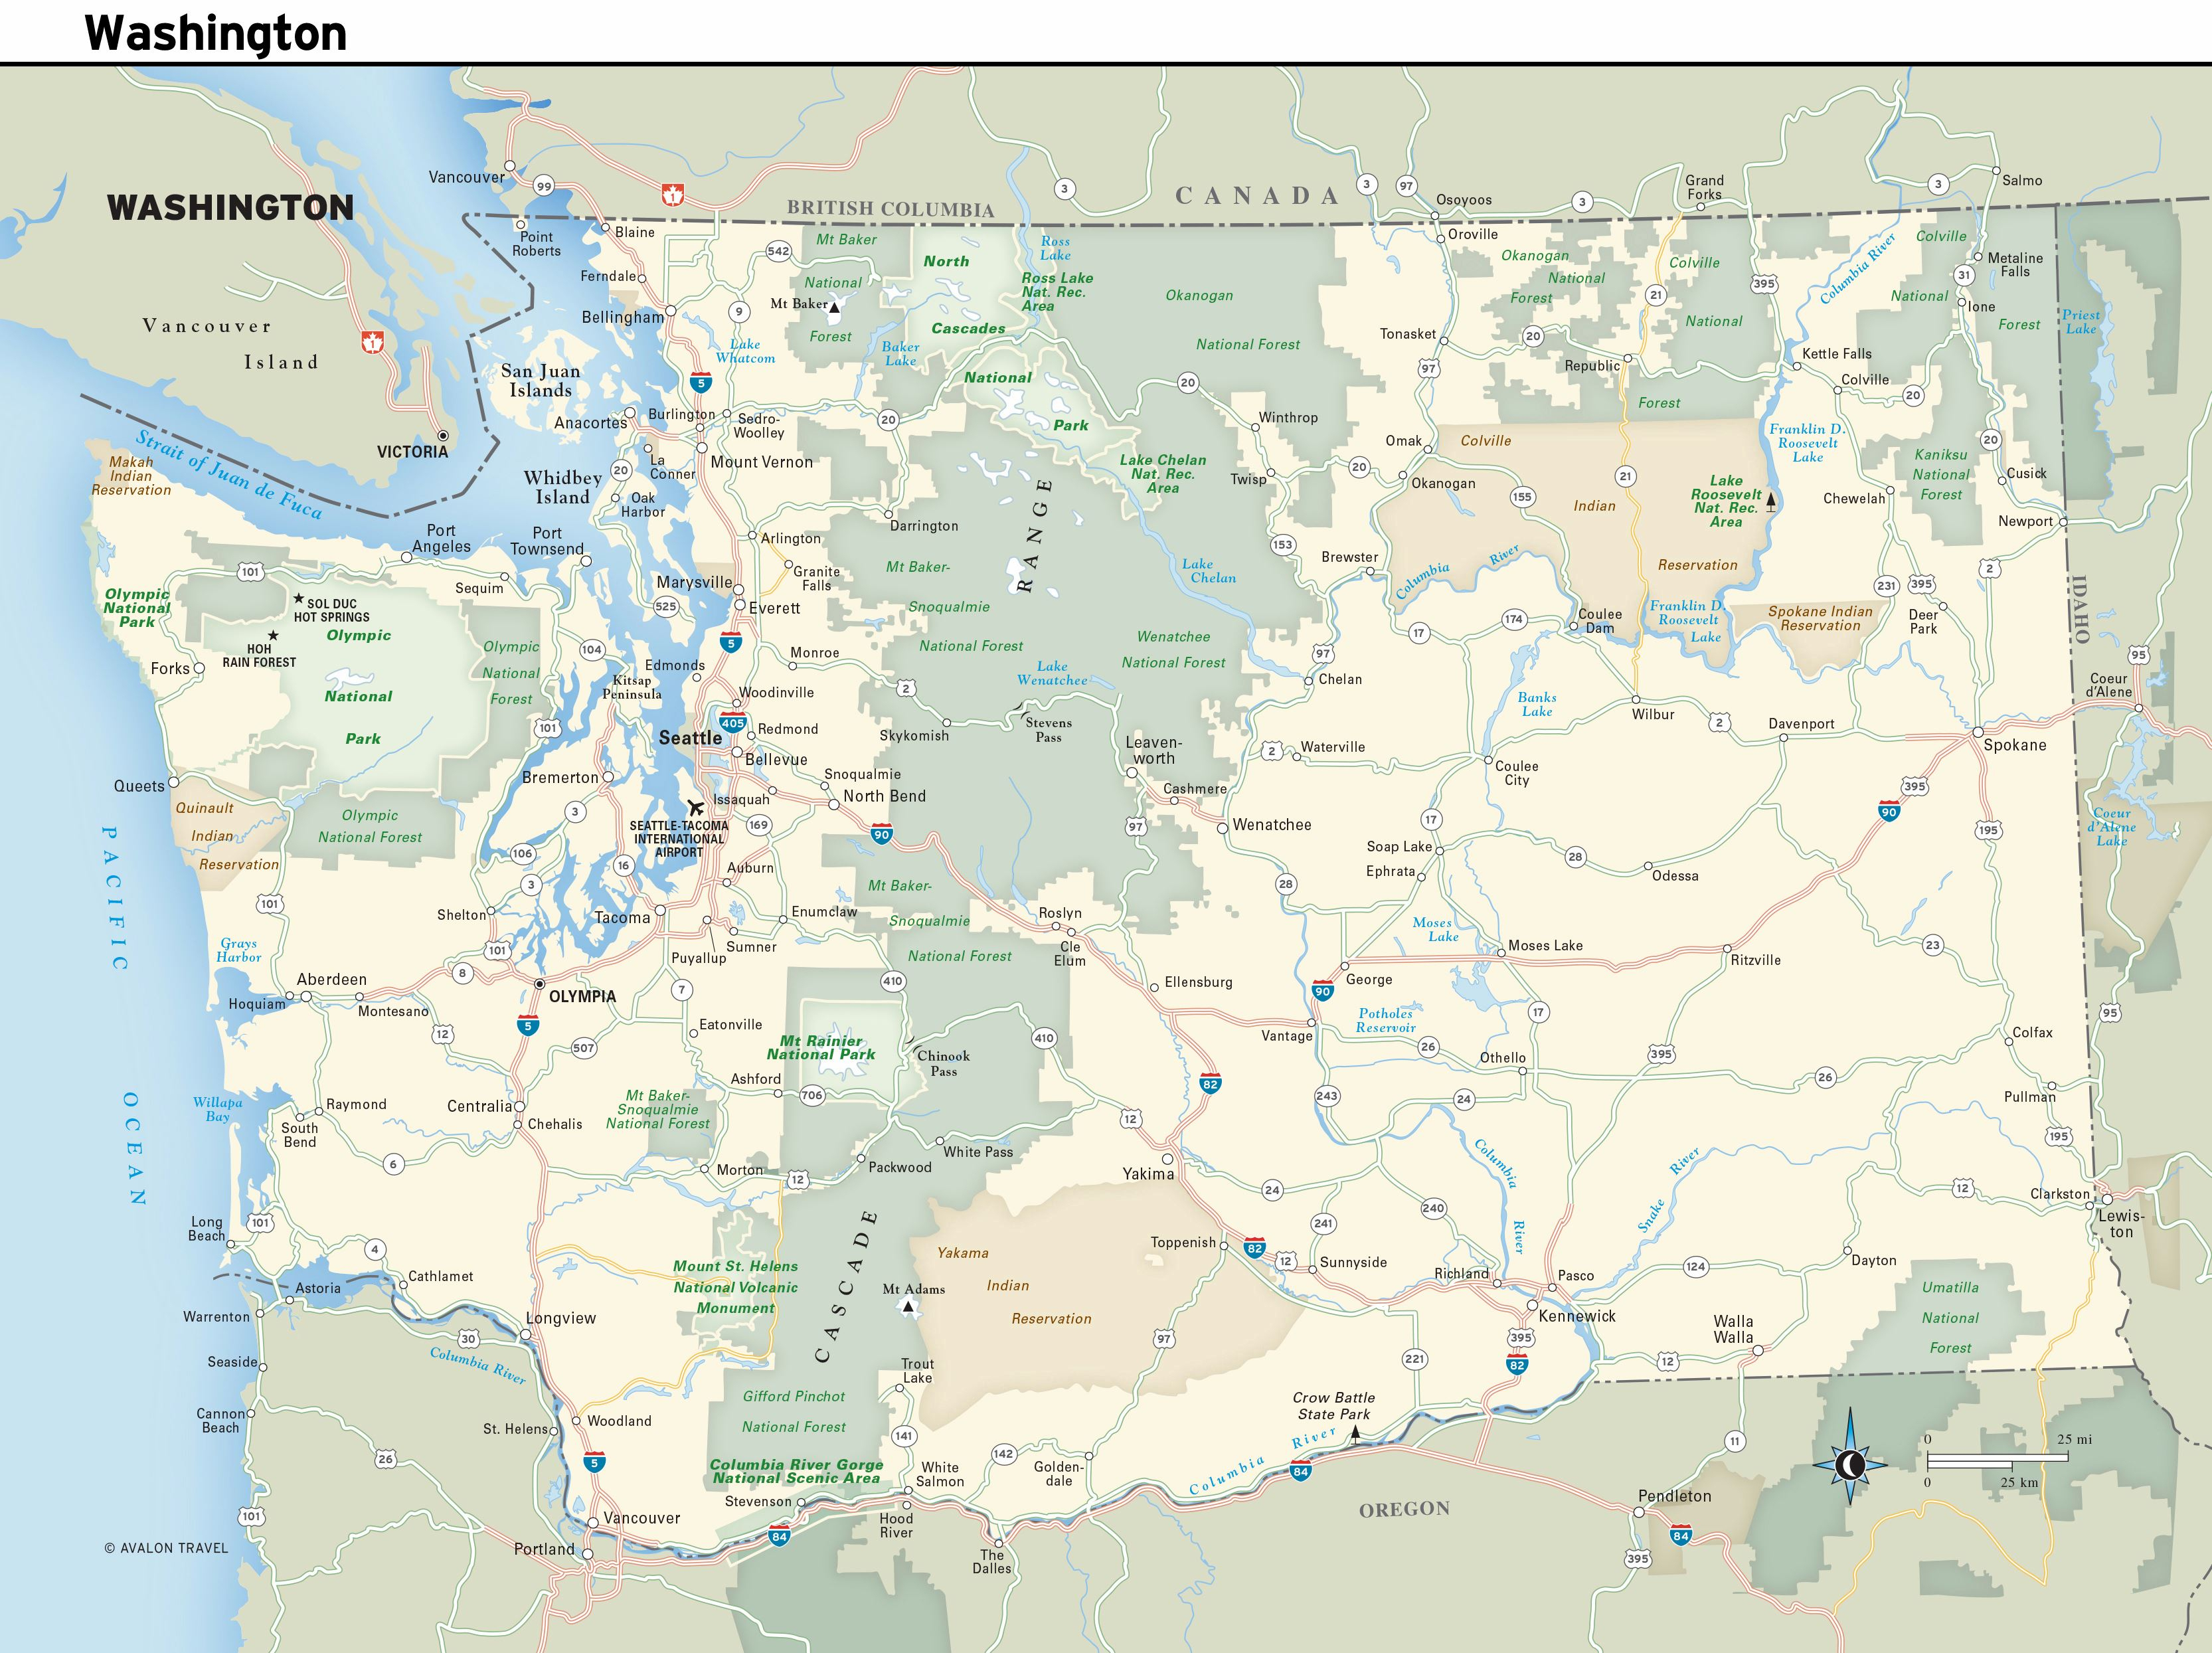 Large Washington Dc Maps For Free Download And Print | High - Printable Map Of Washington Dc